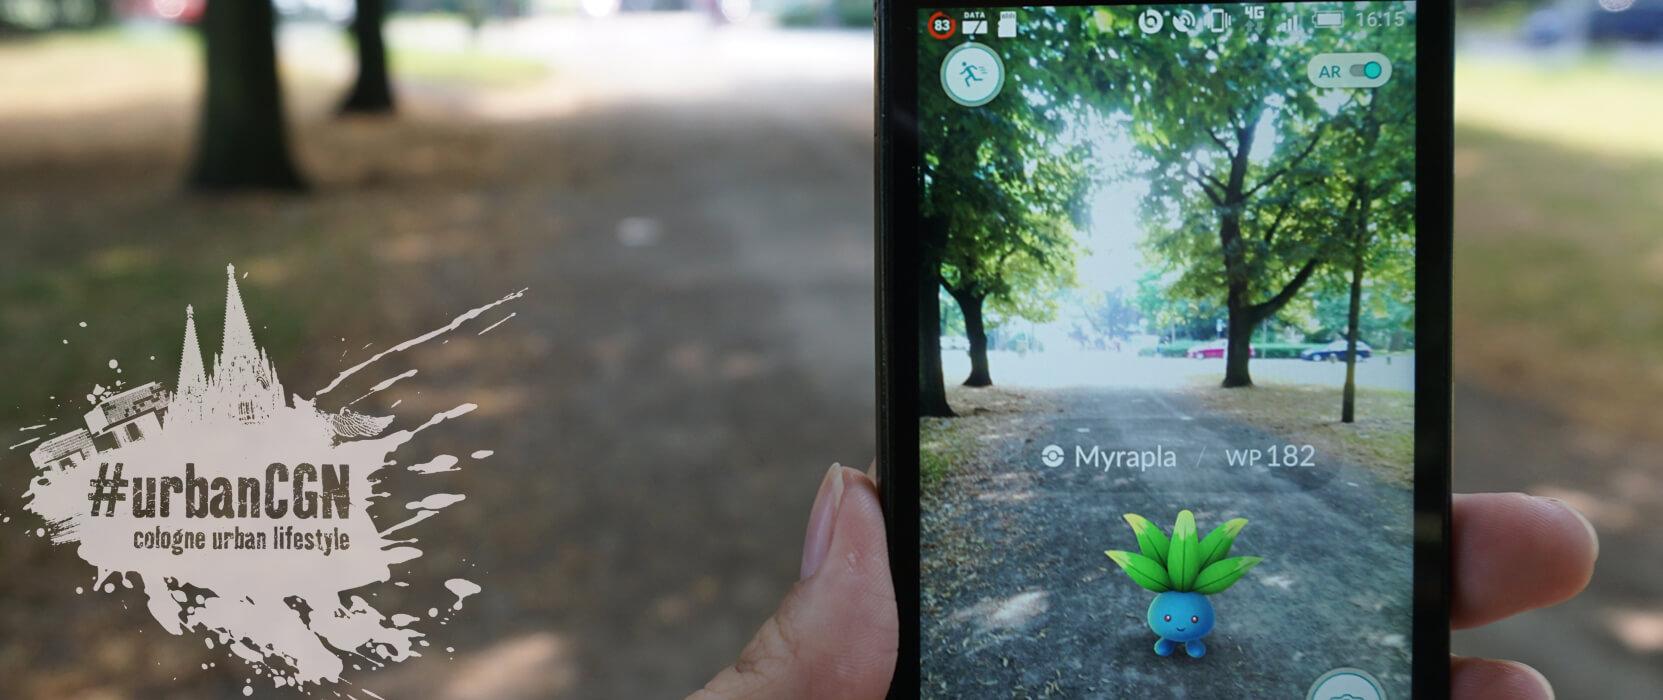 Die besten Pokémon Go-Spots in Köln